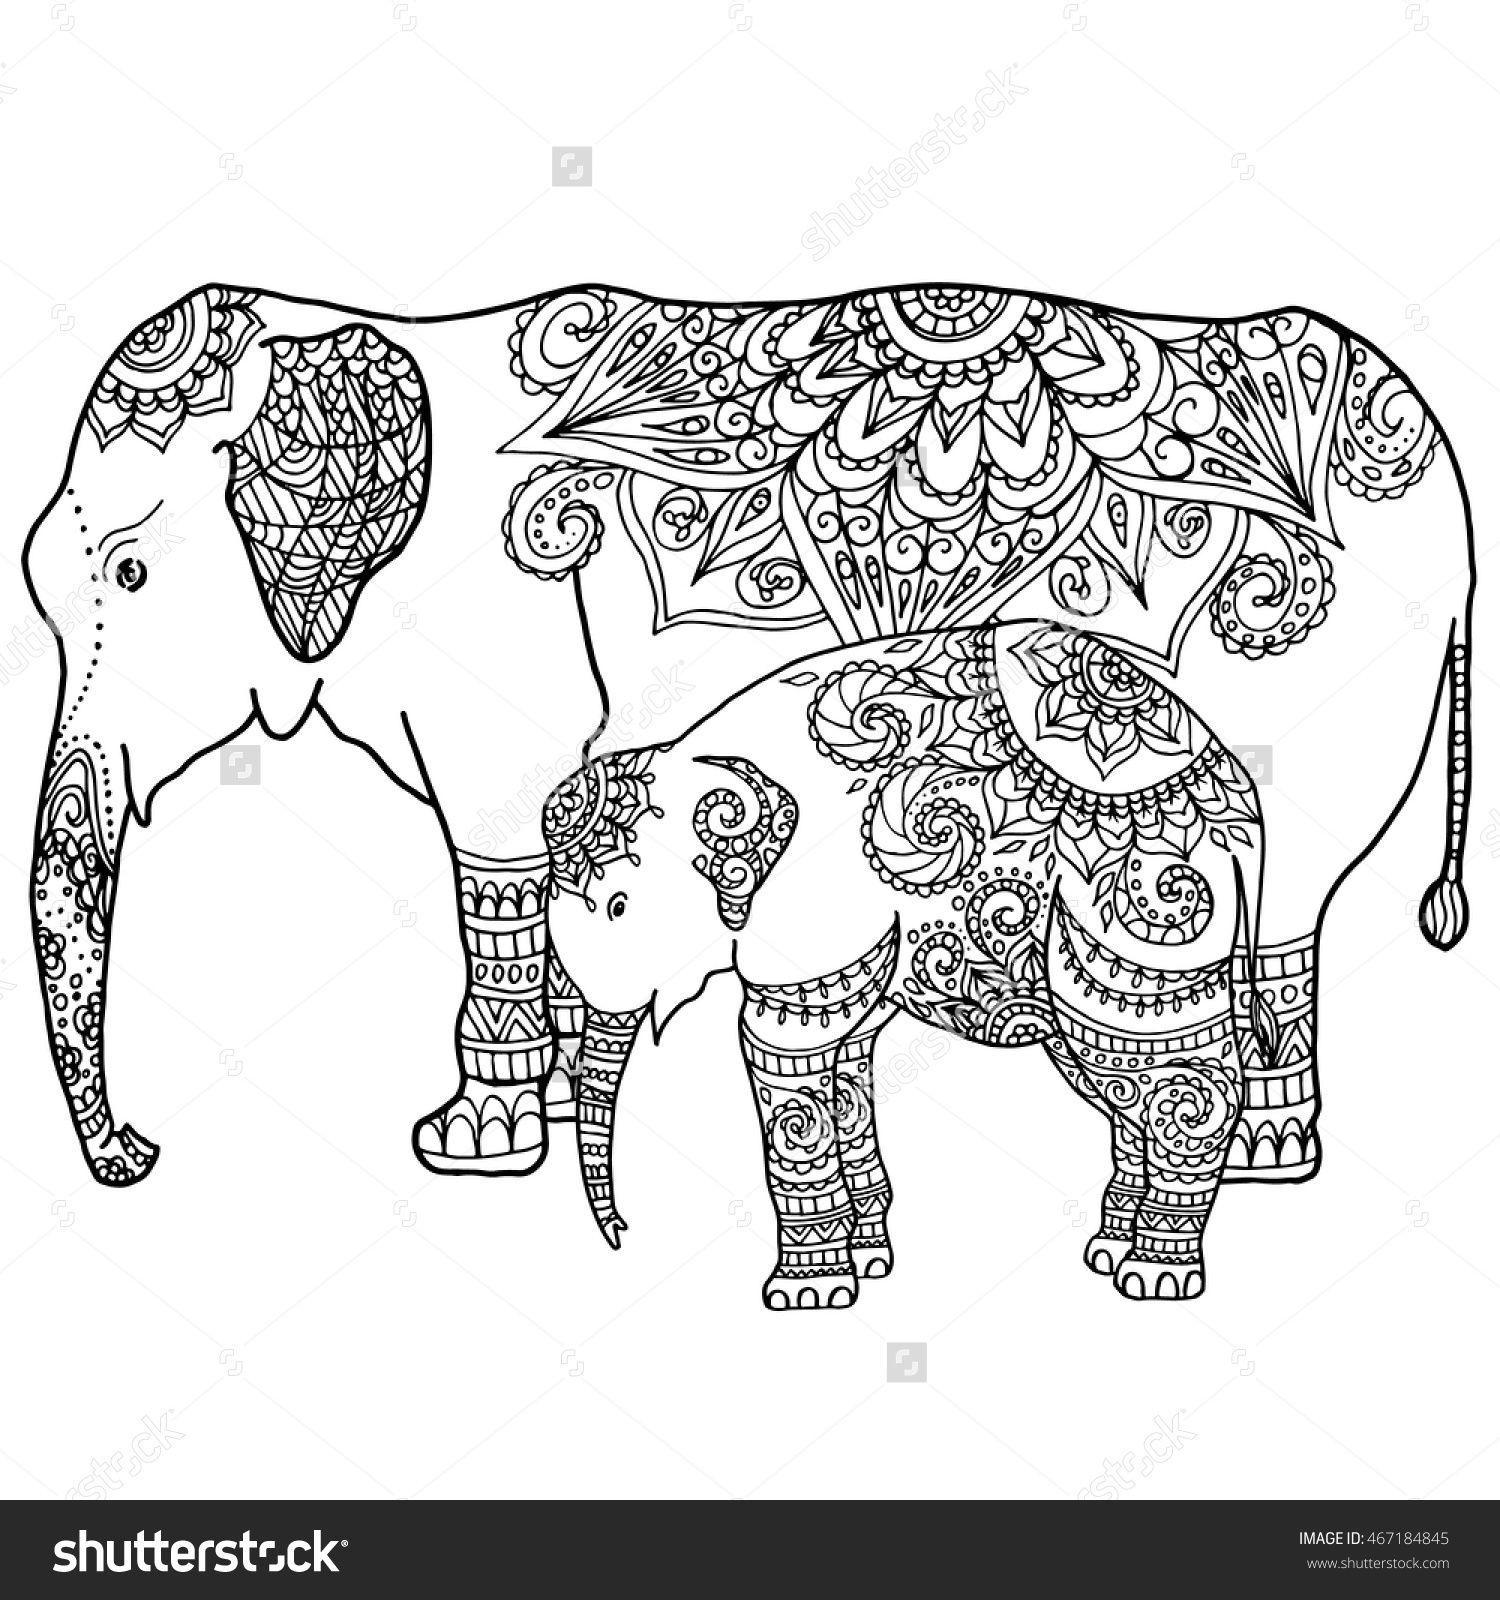 image.shutterstock.com z stock-vector-hand-drawn-zentangle-elephant ...